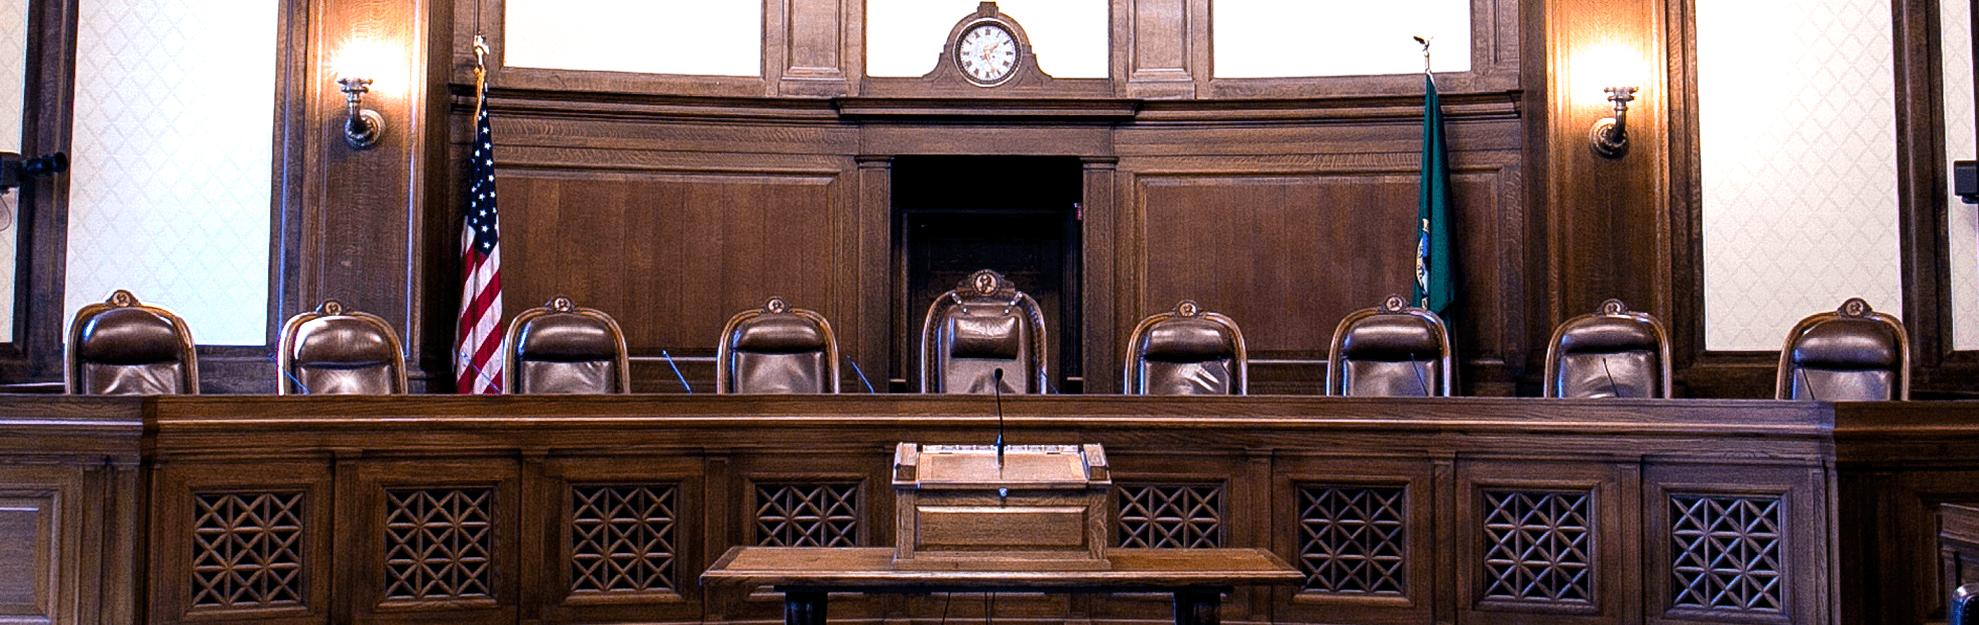 Washington State Courts - Supreme Court